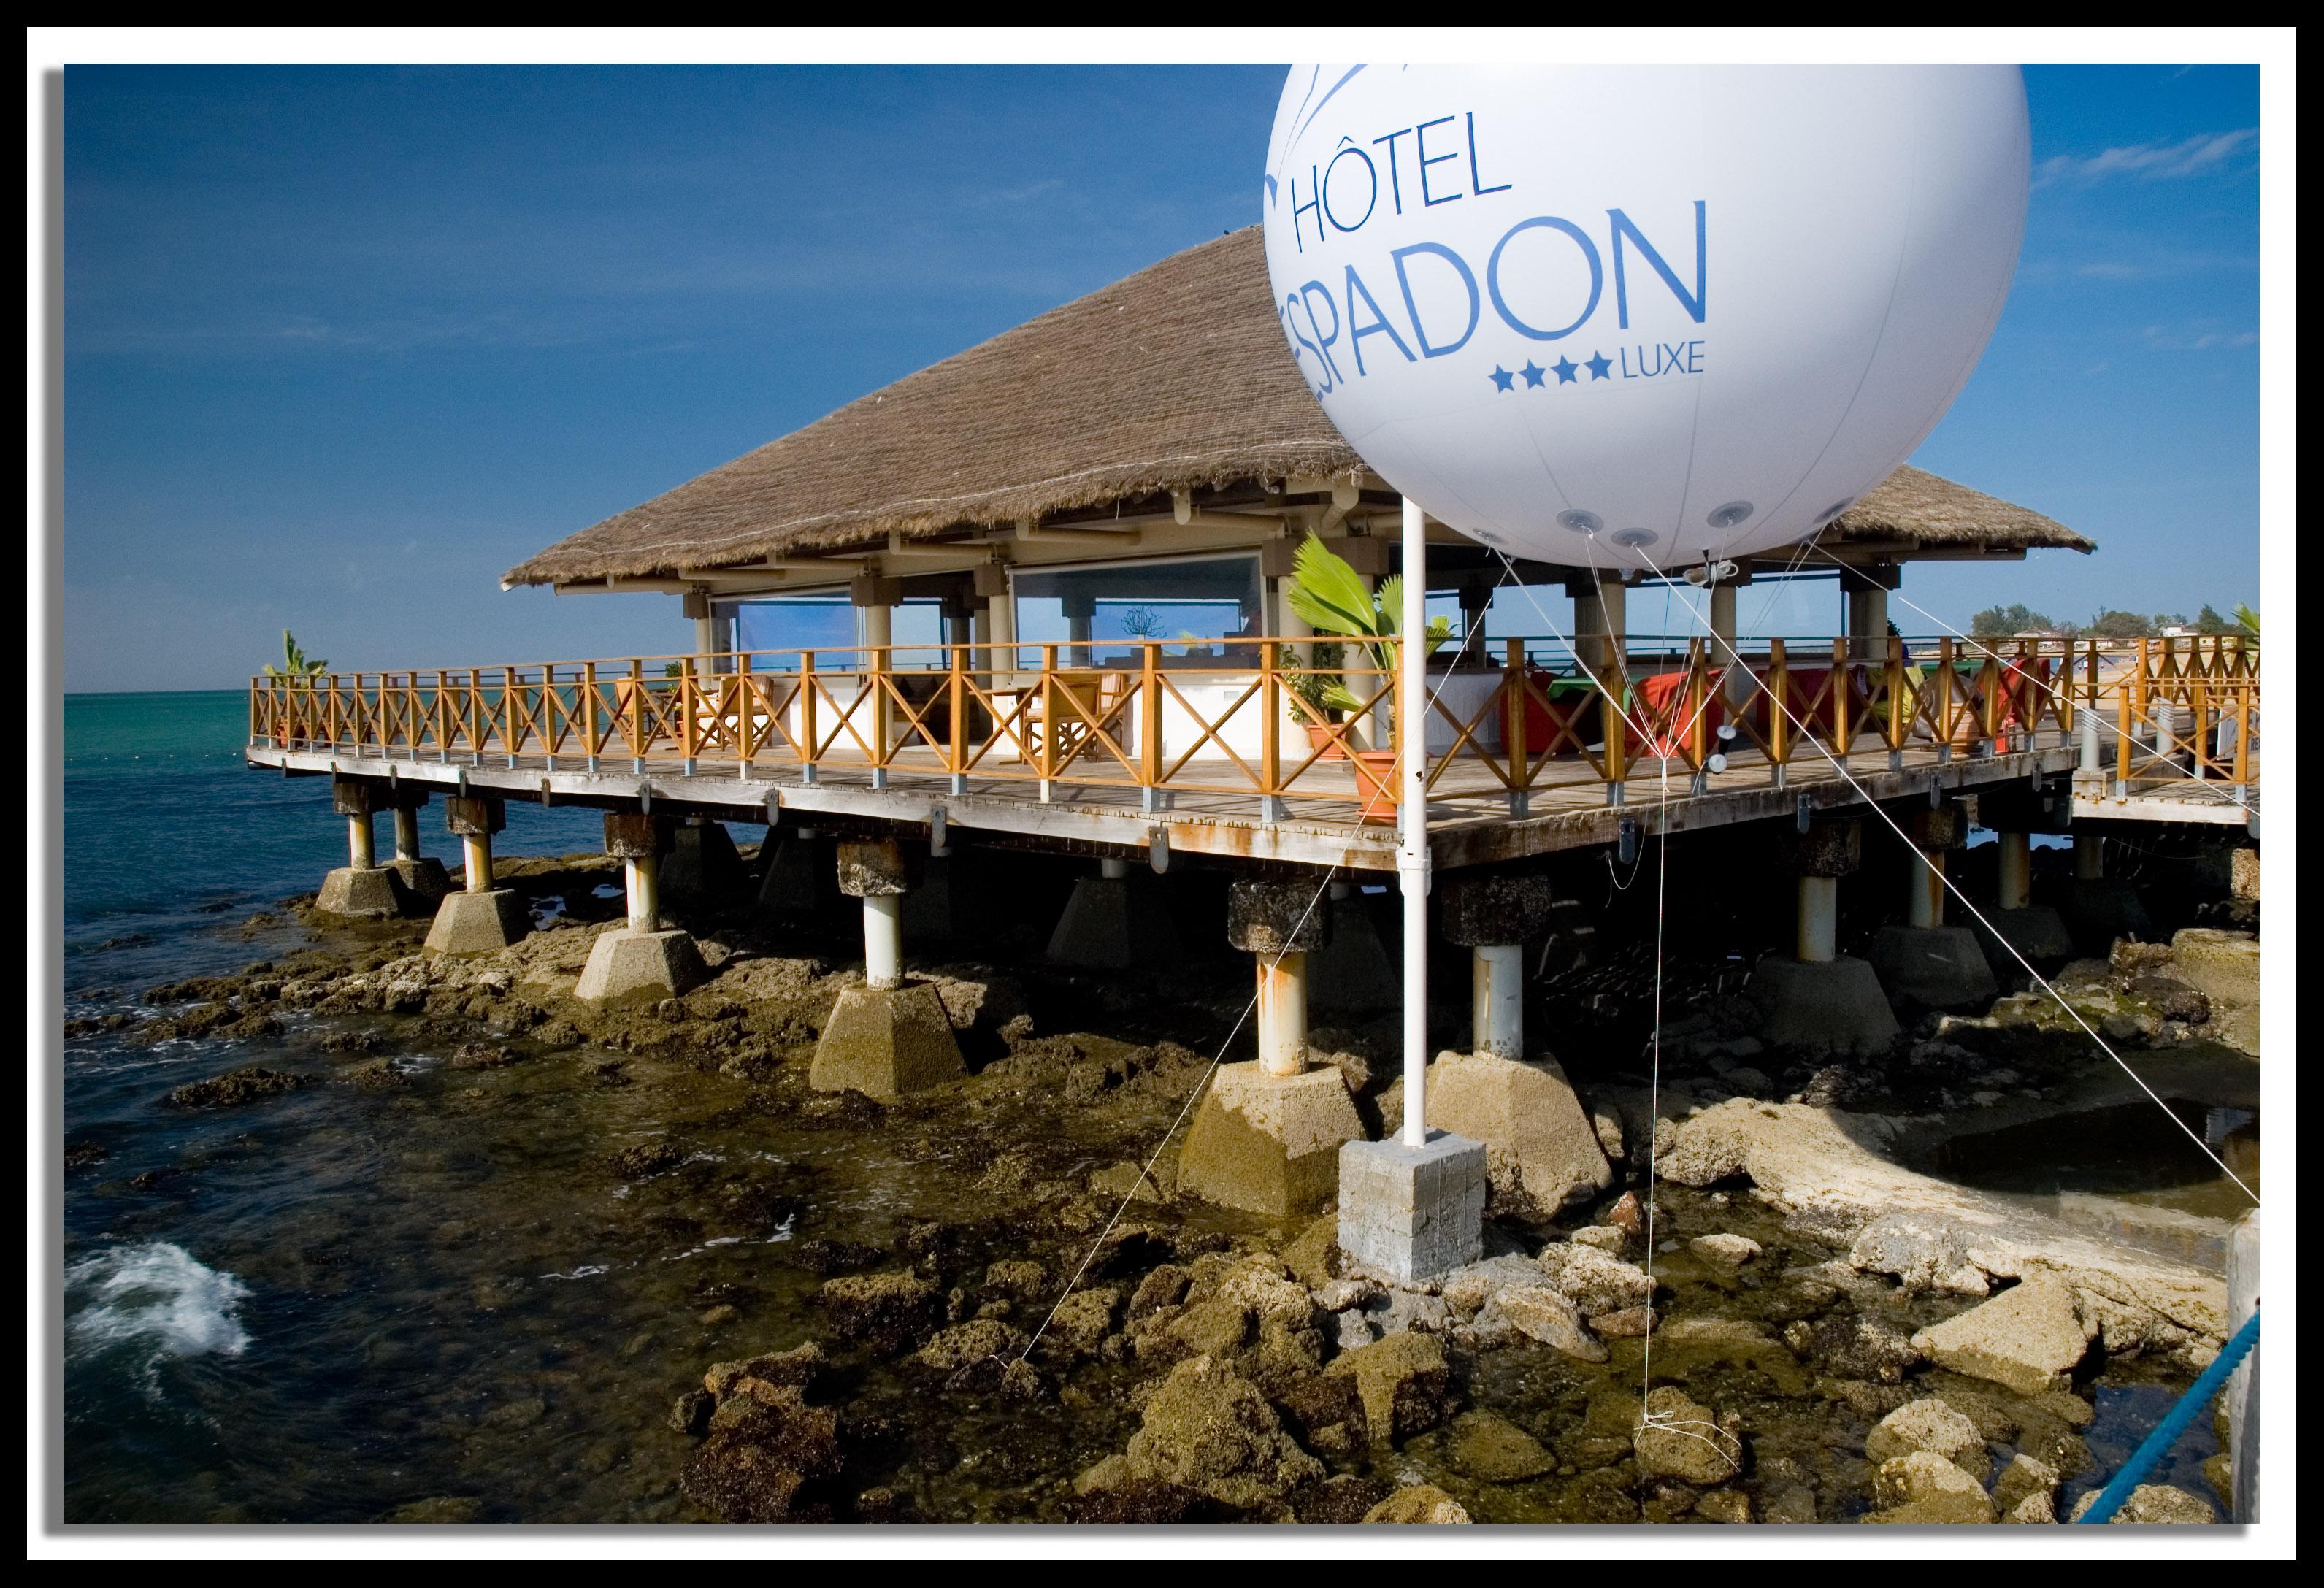 HotelEspadon